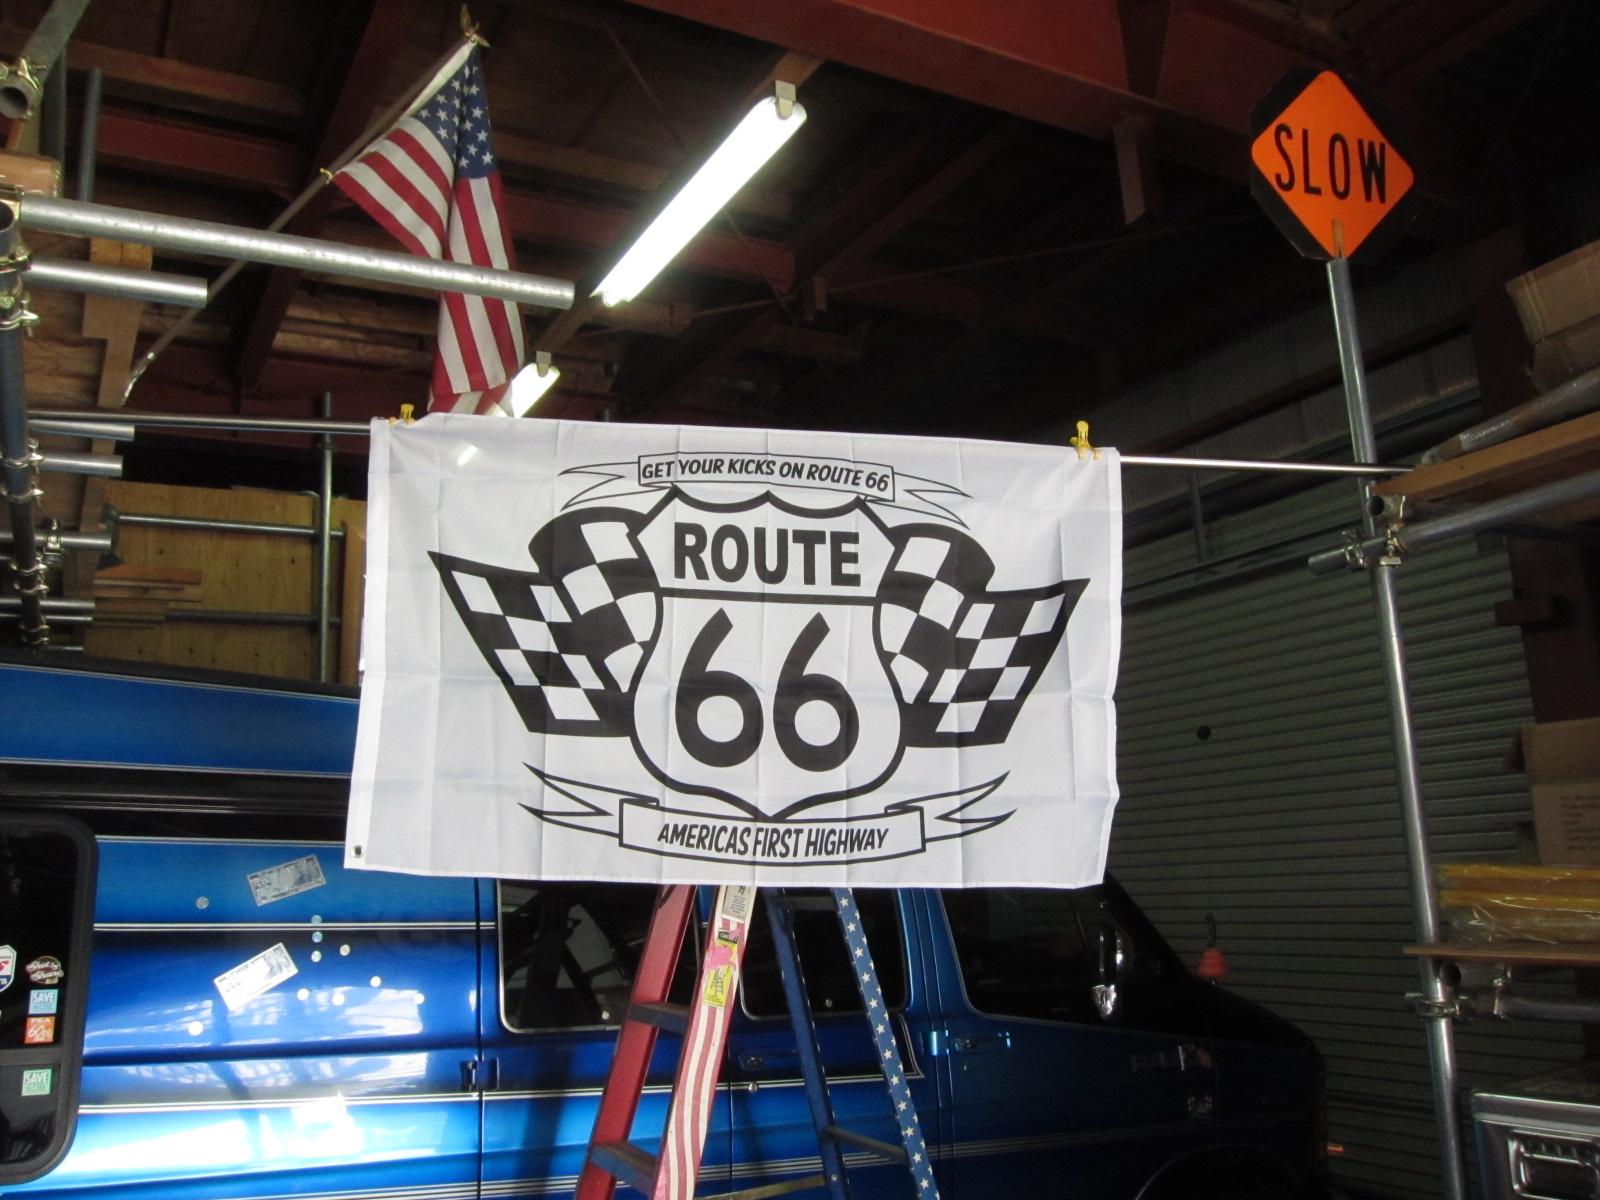 R66 CHECKER FLAG 3x5ft ★ルート66 チェッカー フラッグ [並行輸入品]